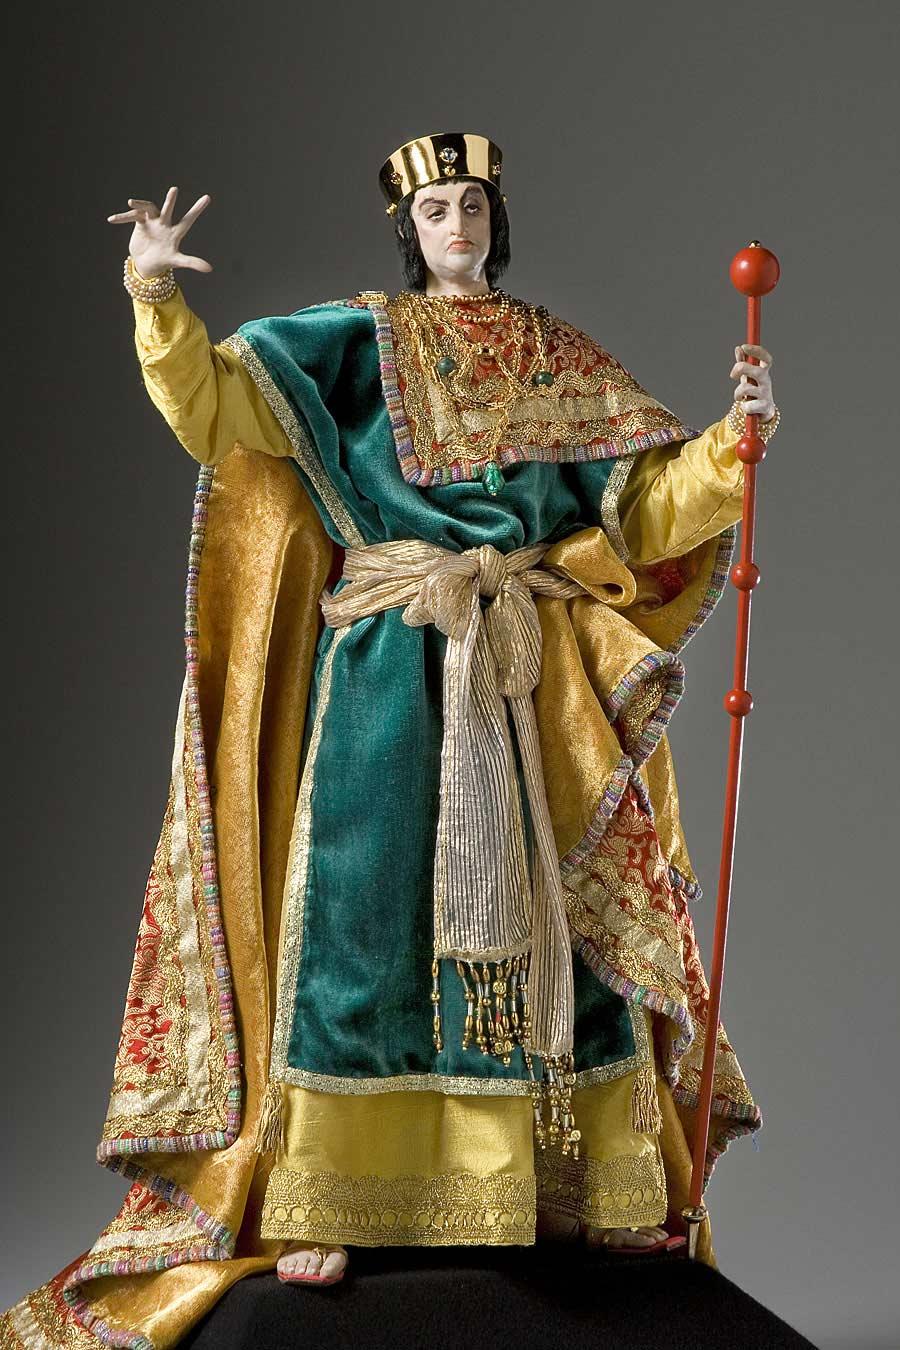 Full length color image of Herod Antipater (v1) aka. Antipas, by George Stuart.